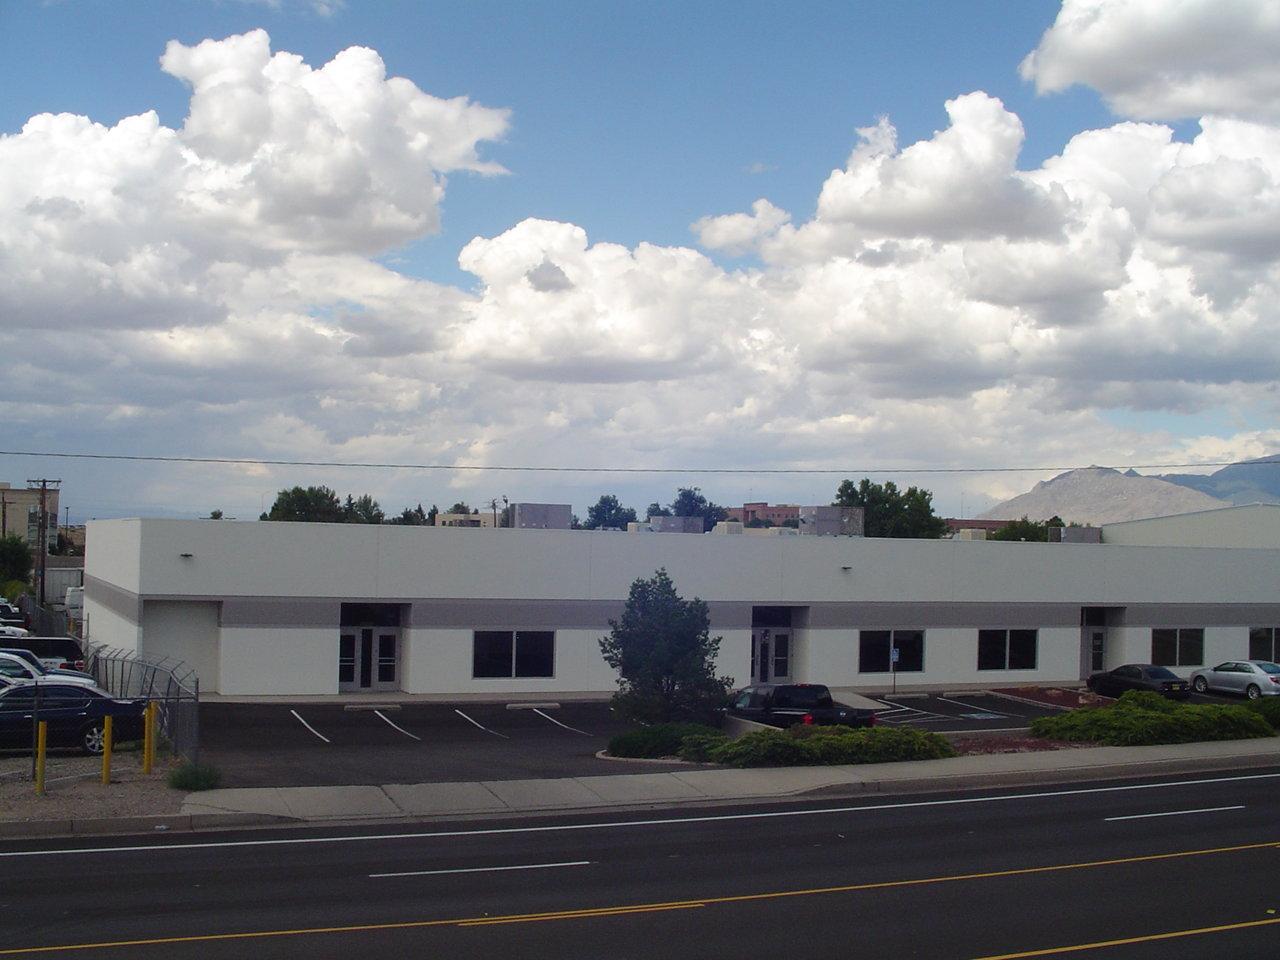 2513 Comanche Rd NE, Albuquerque, NM, 87107